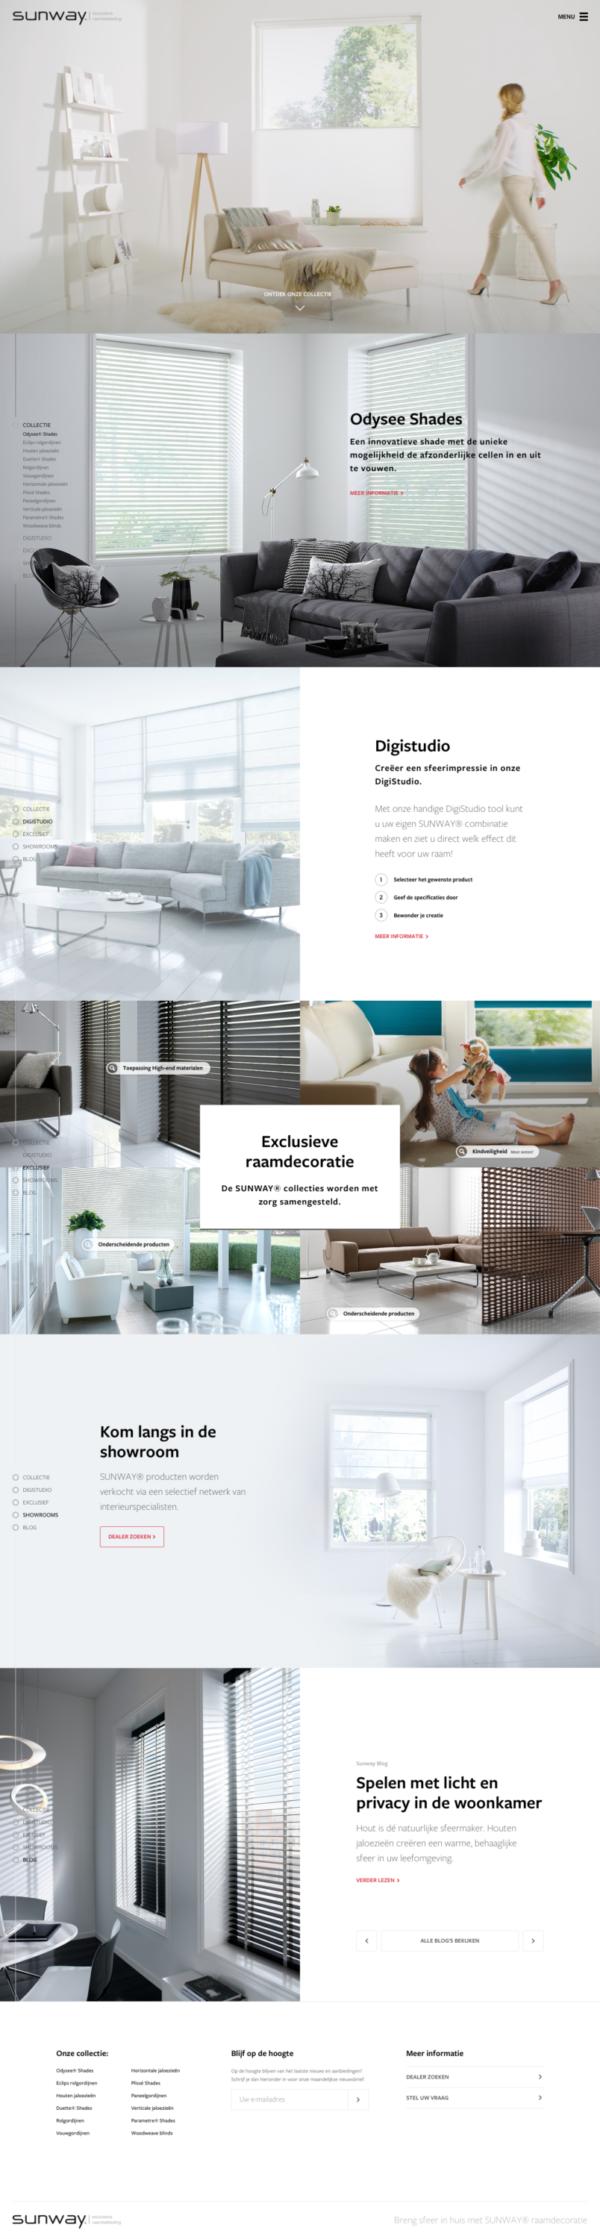 Sunway Homepage